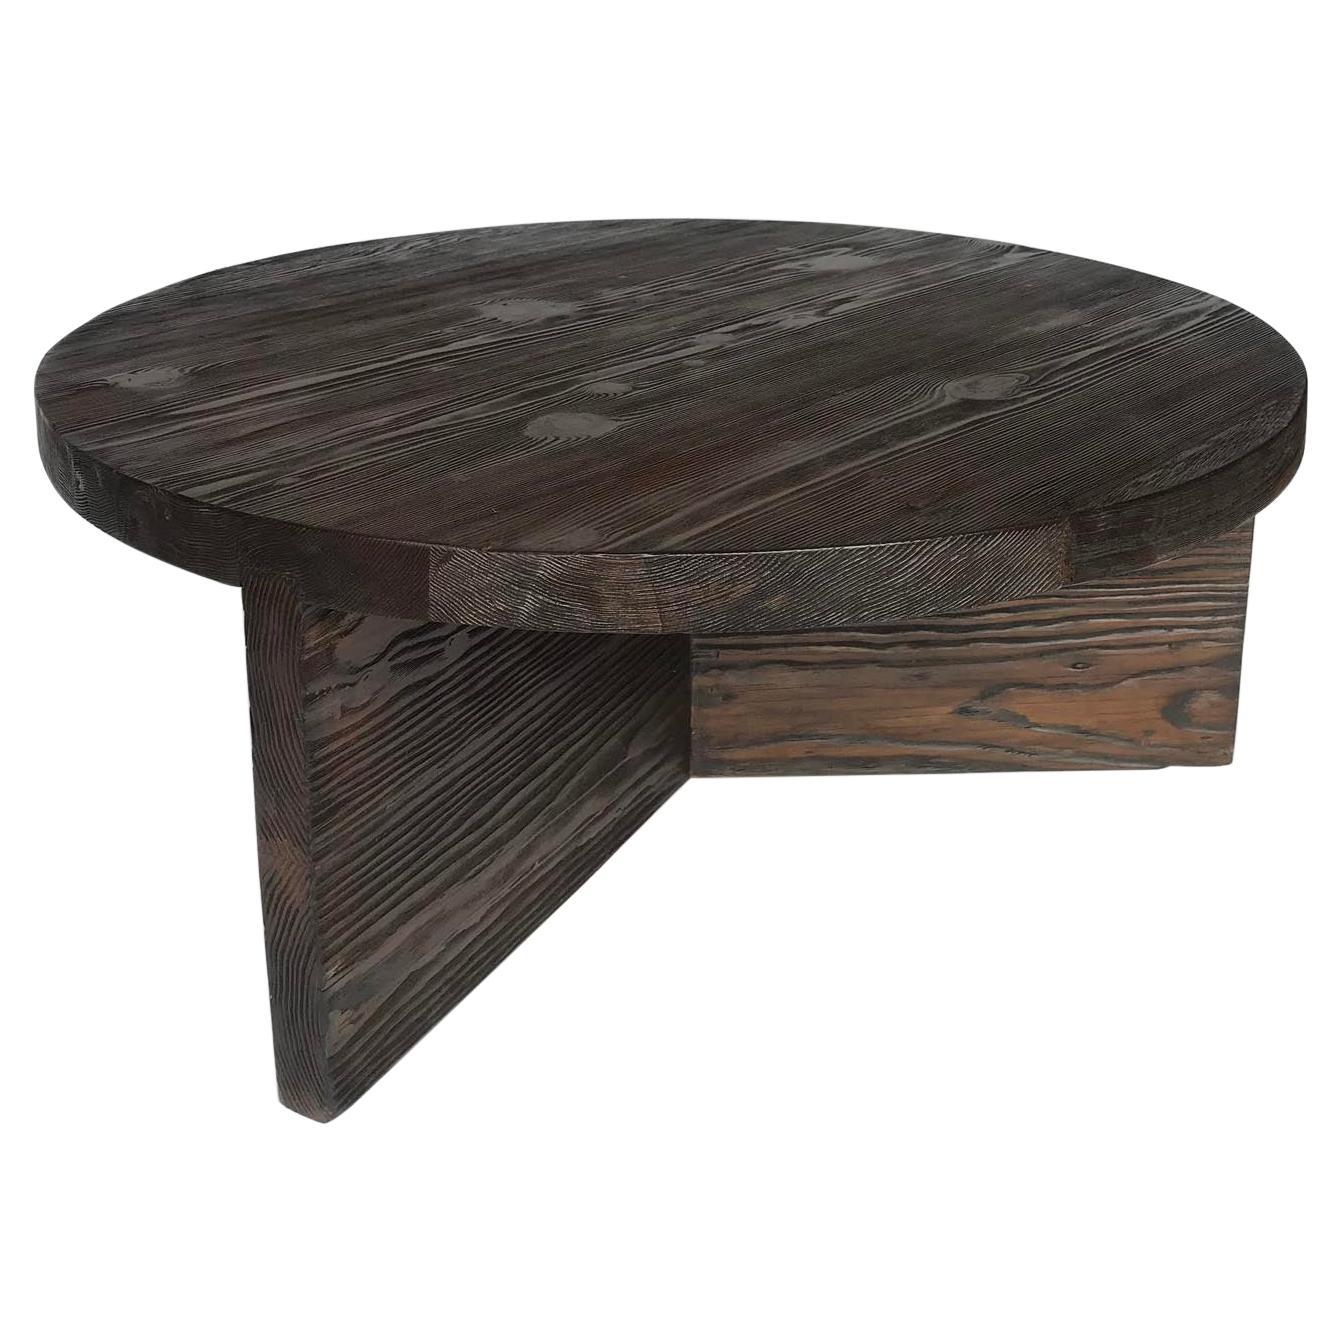 Rustic Reclaimed Wood Coffee Table